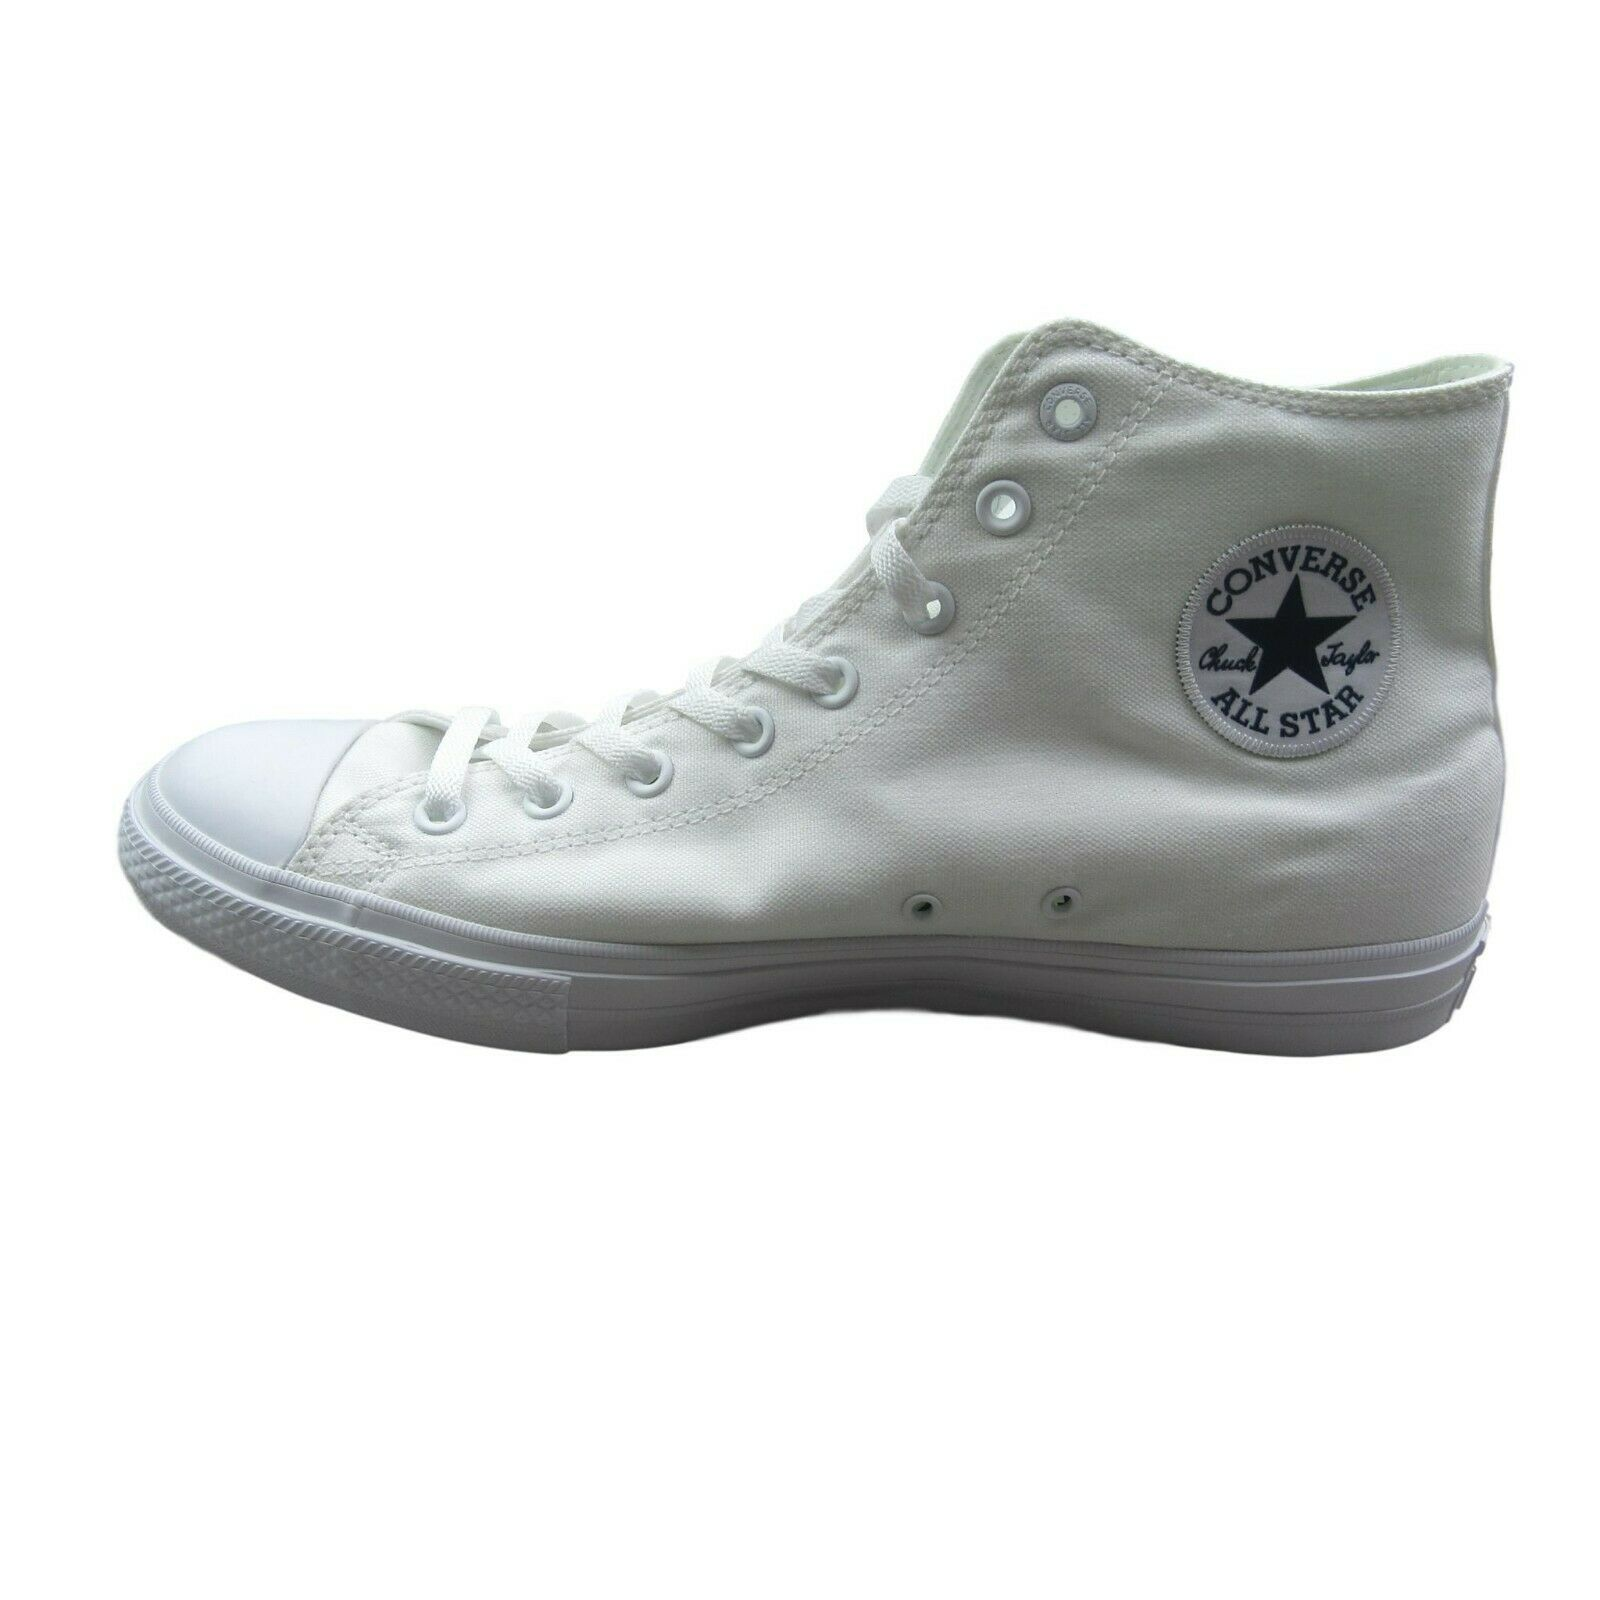 ee674466461f Converse Chuck Taylor All Star II Hi Shoes Size 13 Lunarlon White ...